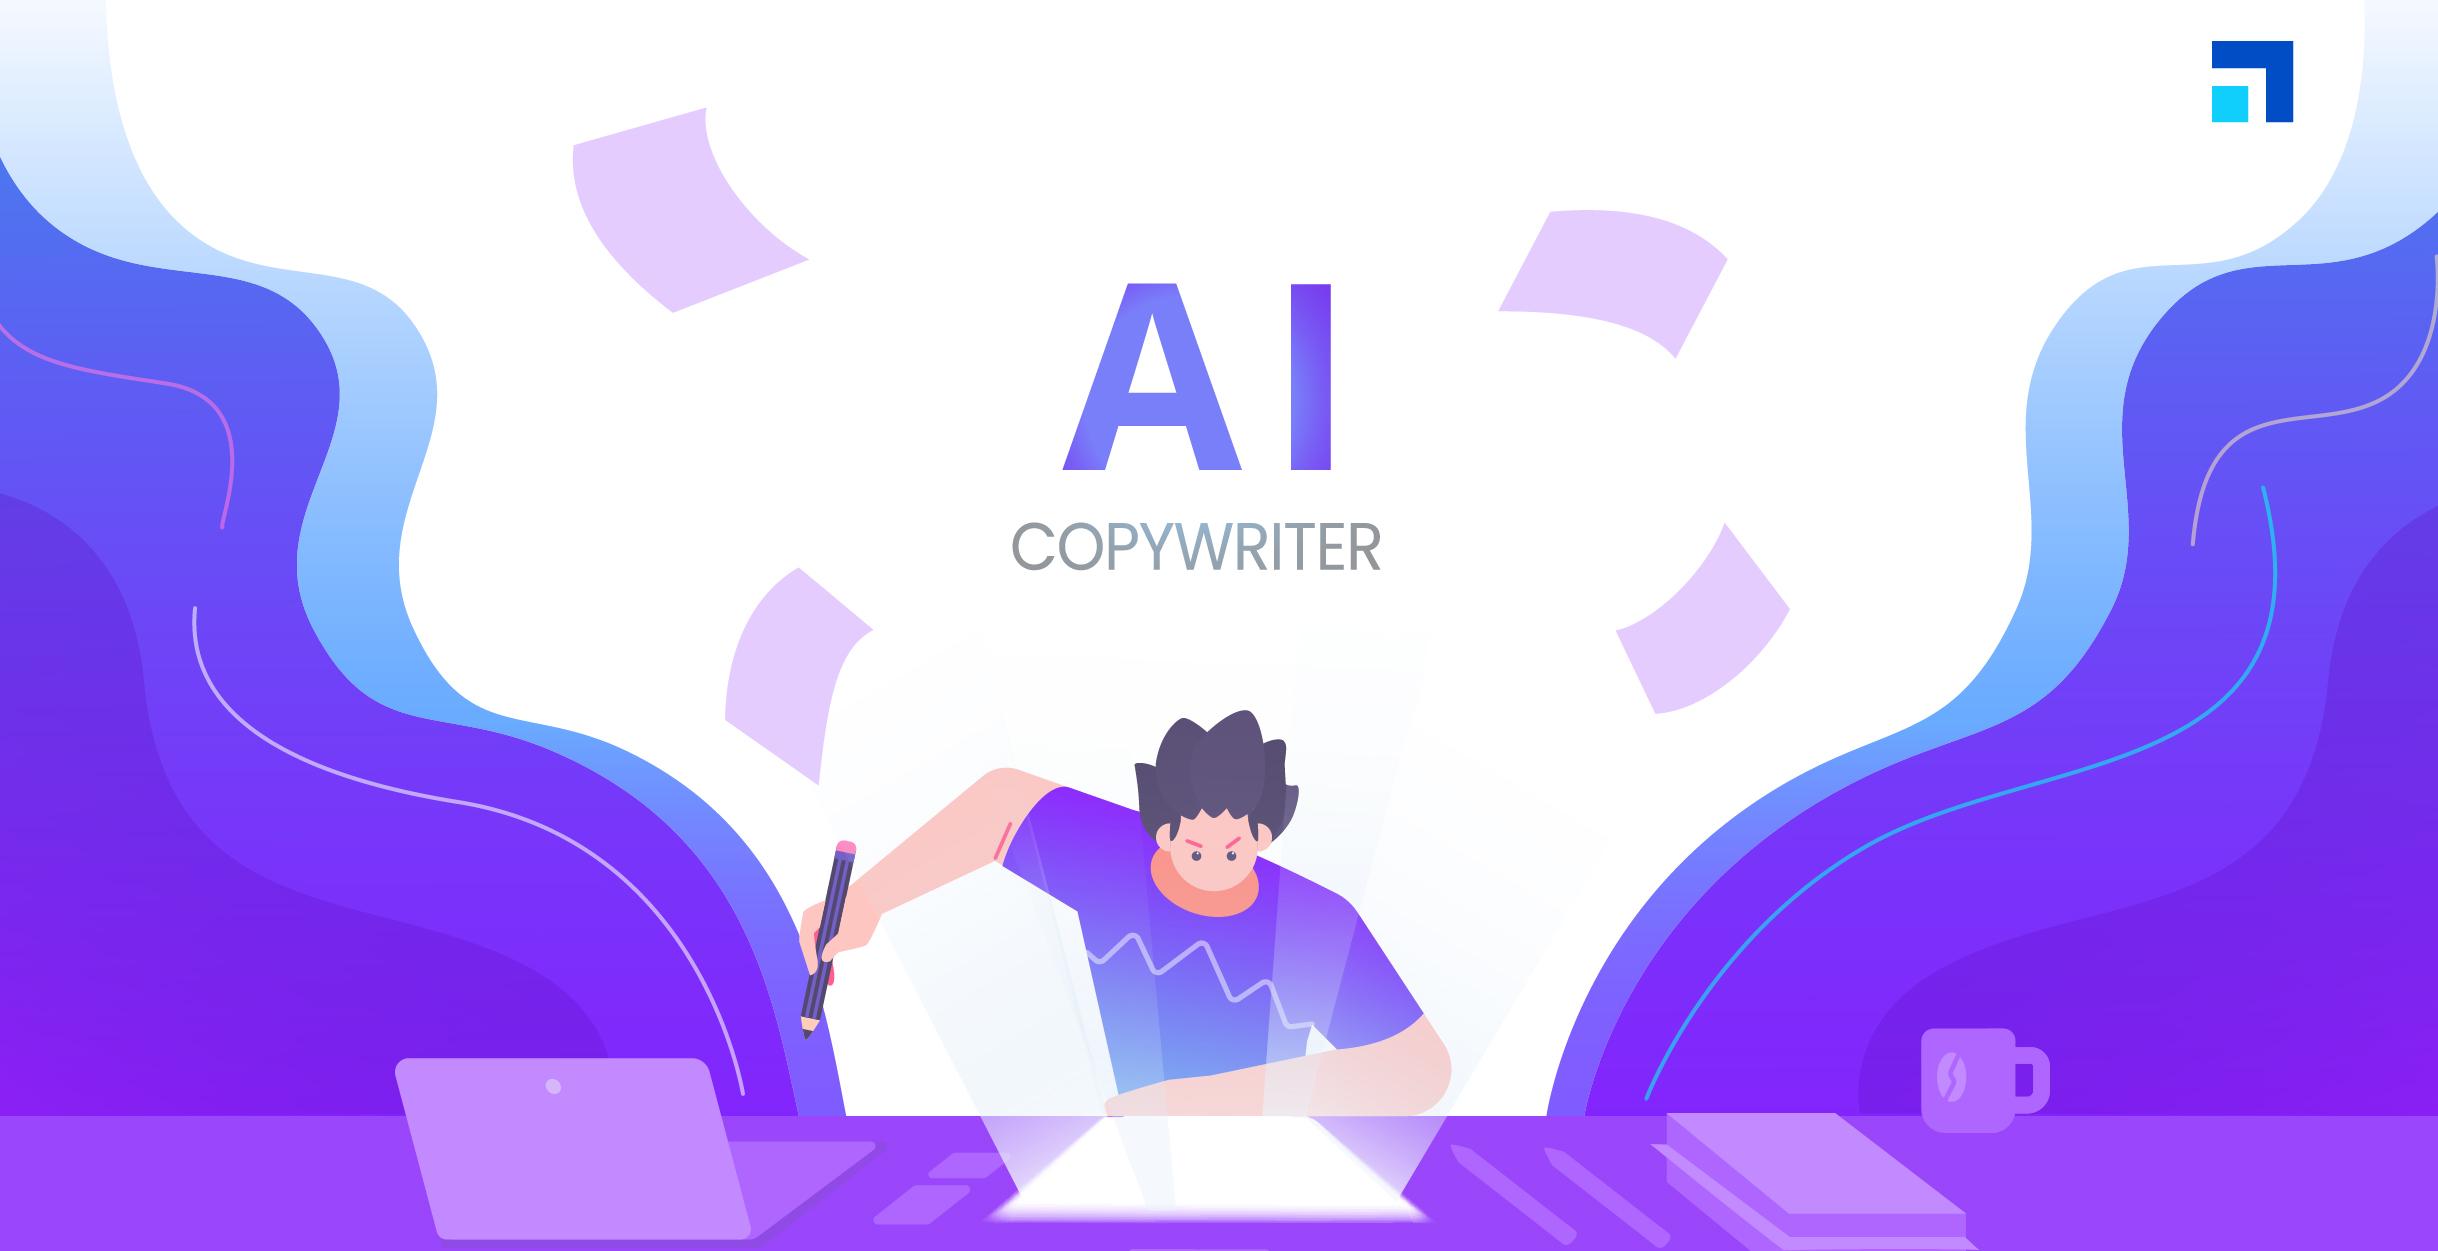 A Writer's Magic Wand: The AI Copywriter